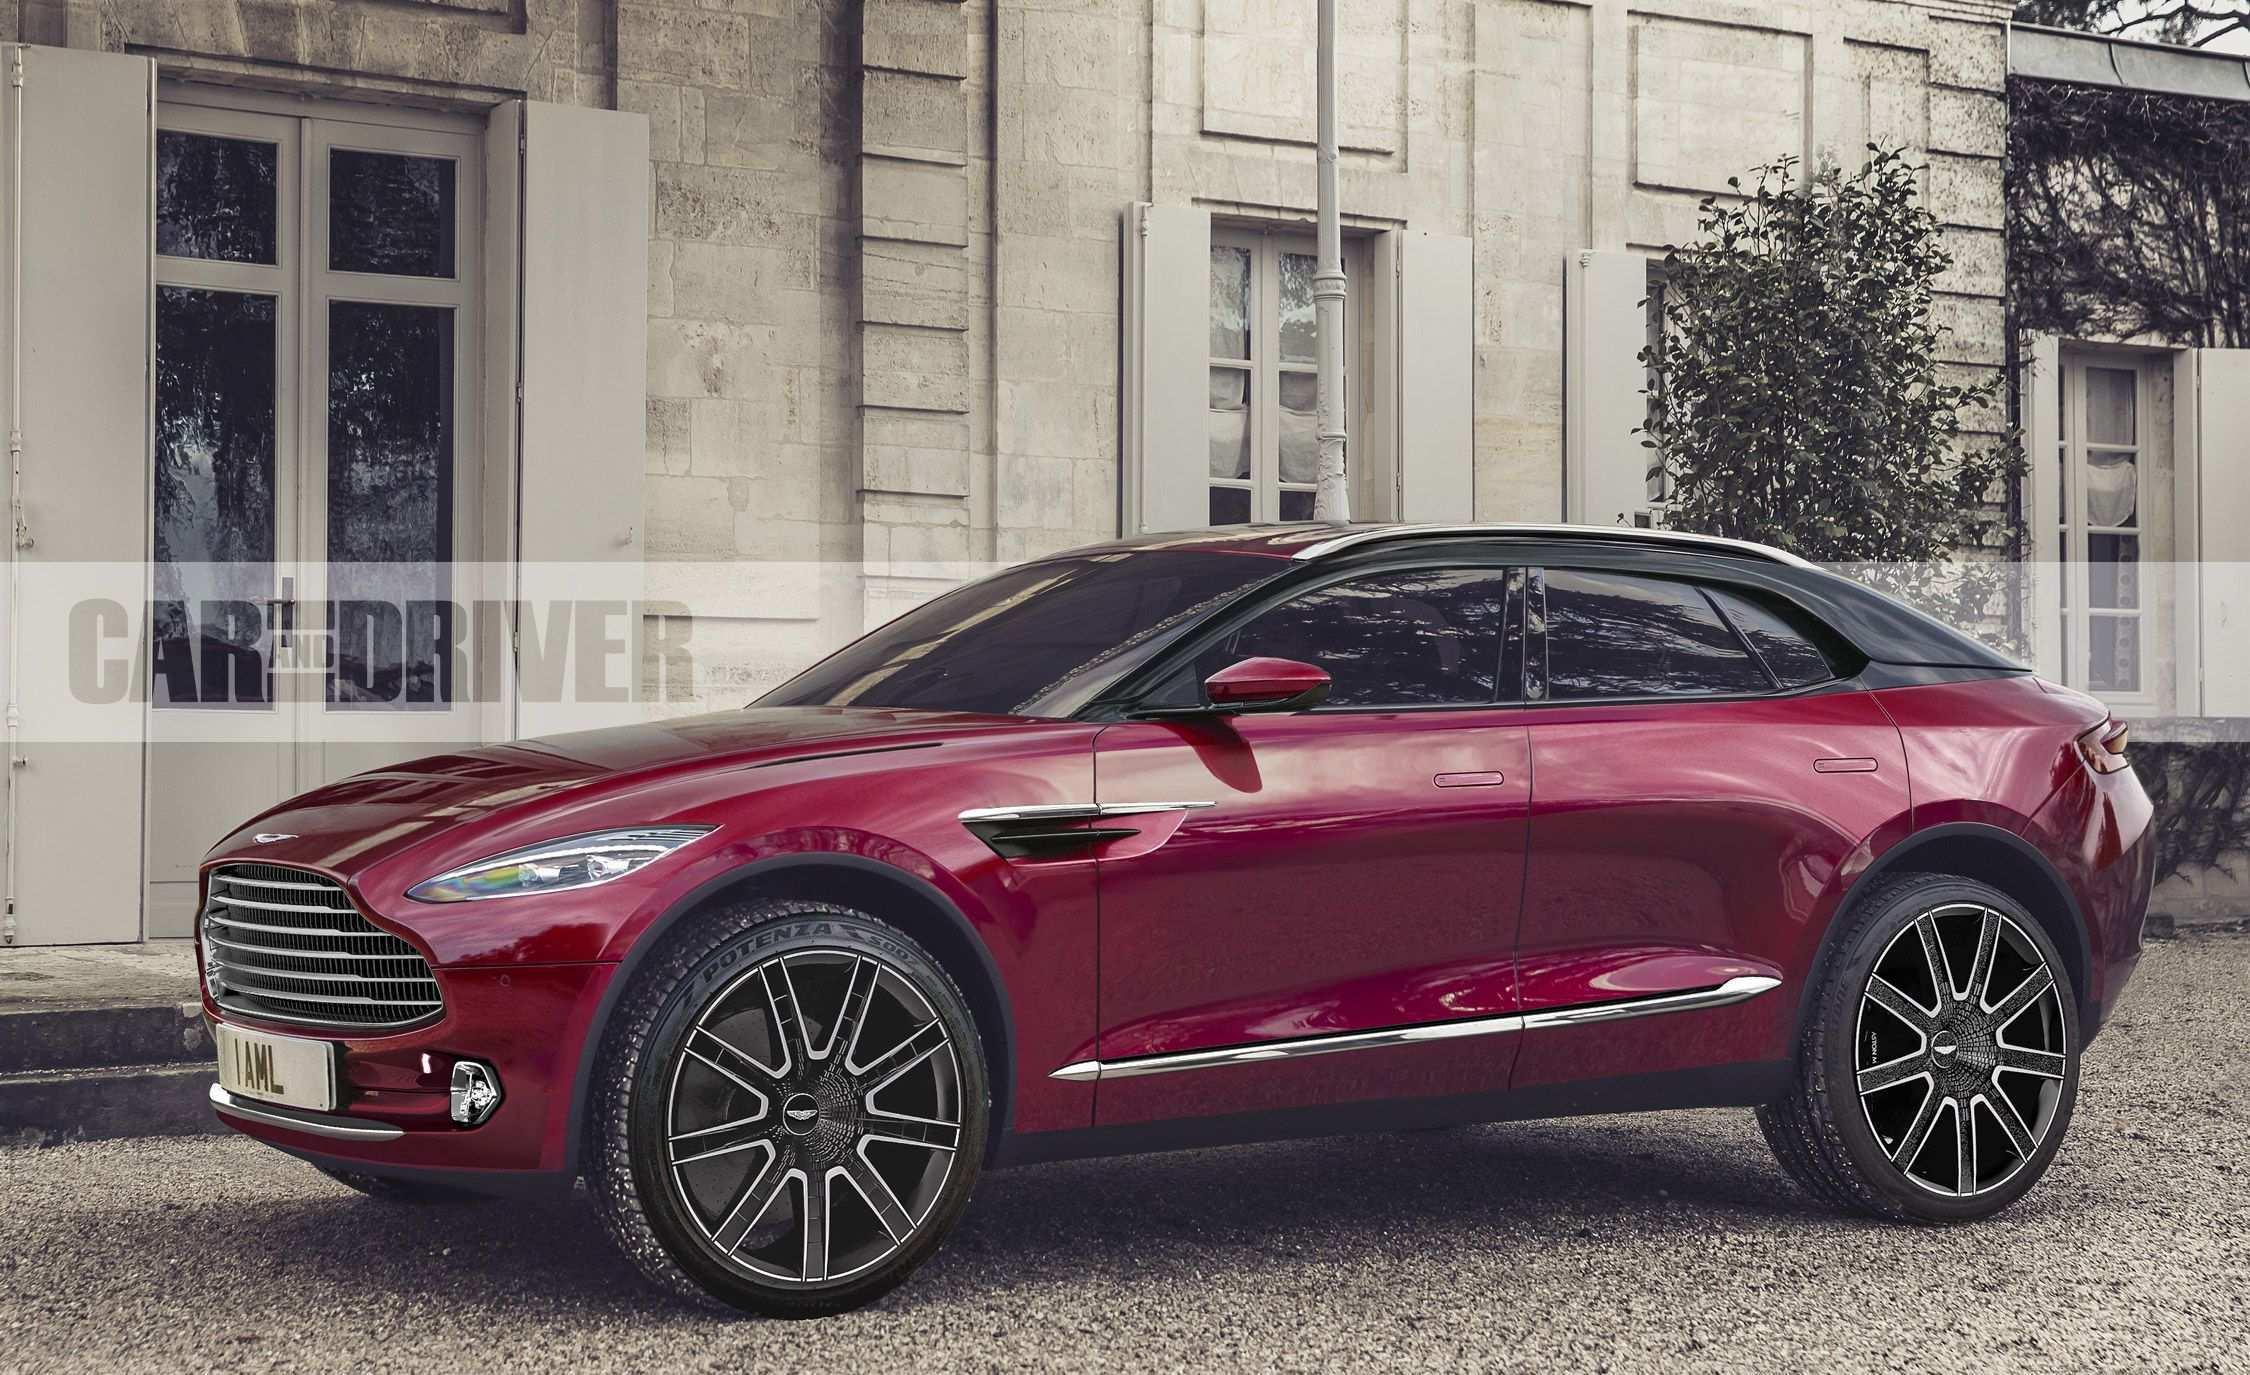 95 Great 2019 Aston Martin Suv History for 2019 Aston Martin Suv